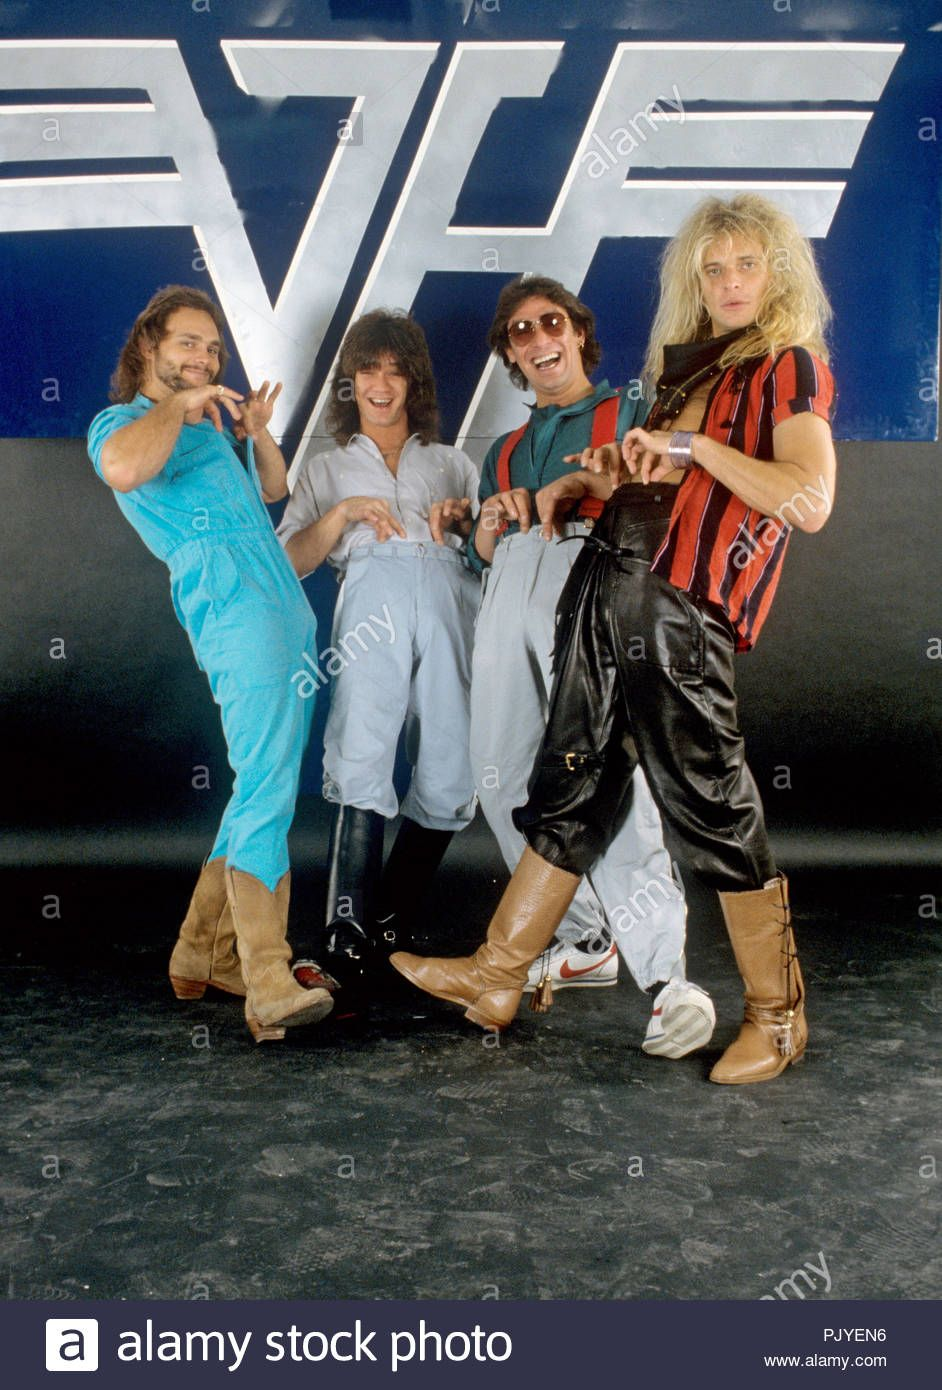 Let S Lean And Flex A Little More Now Rf Van Halen David Lee Roth Eddie Van Halen